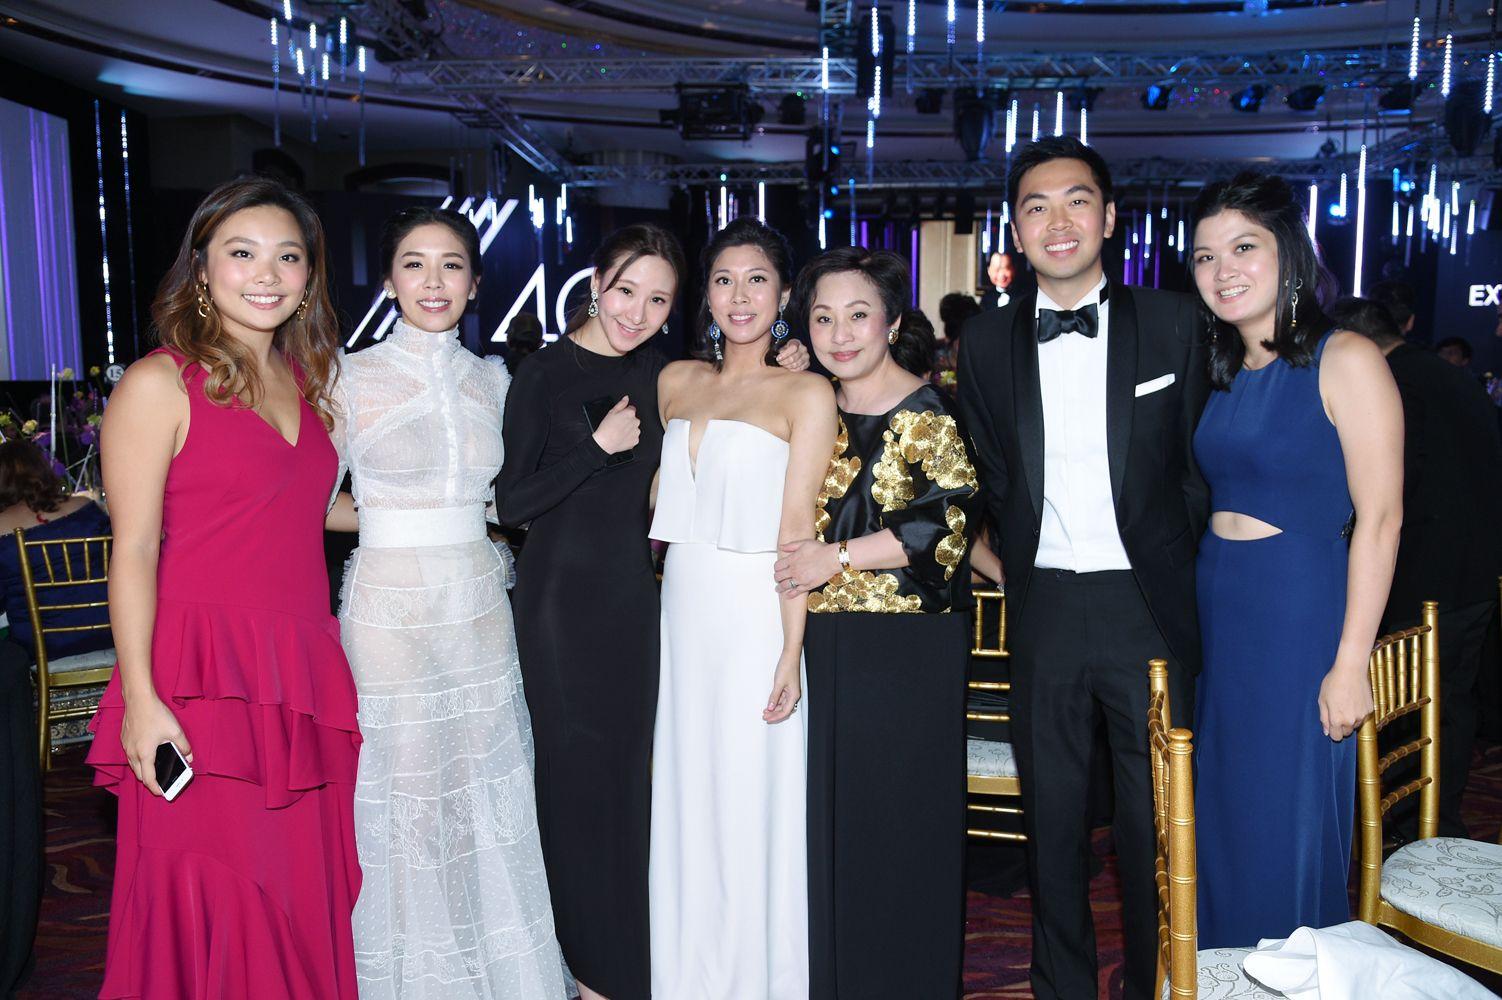 Jenny Lam, Carmen Yim, Stephnie Shek, Amanda Cheung, Nina Lam, Adrian Cheung, Jennifer Cheung